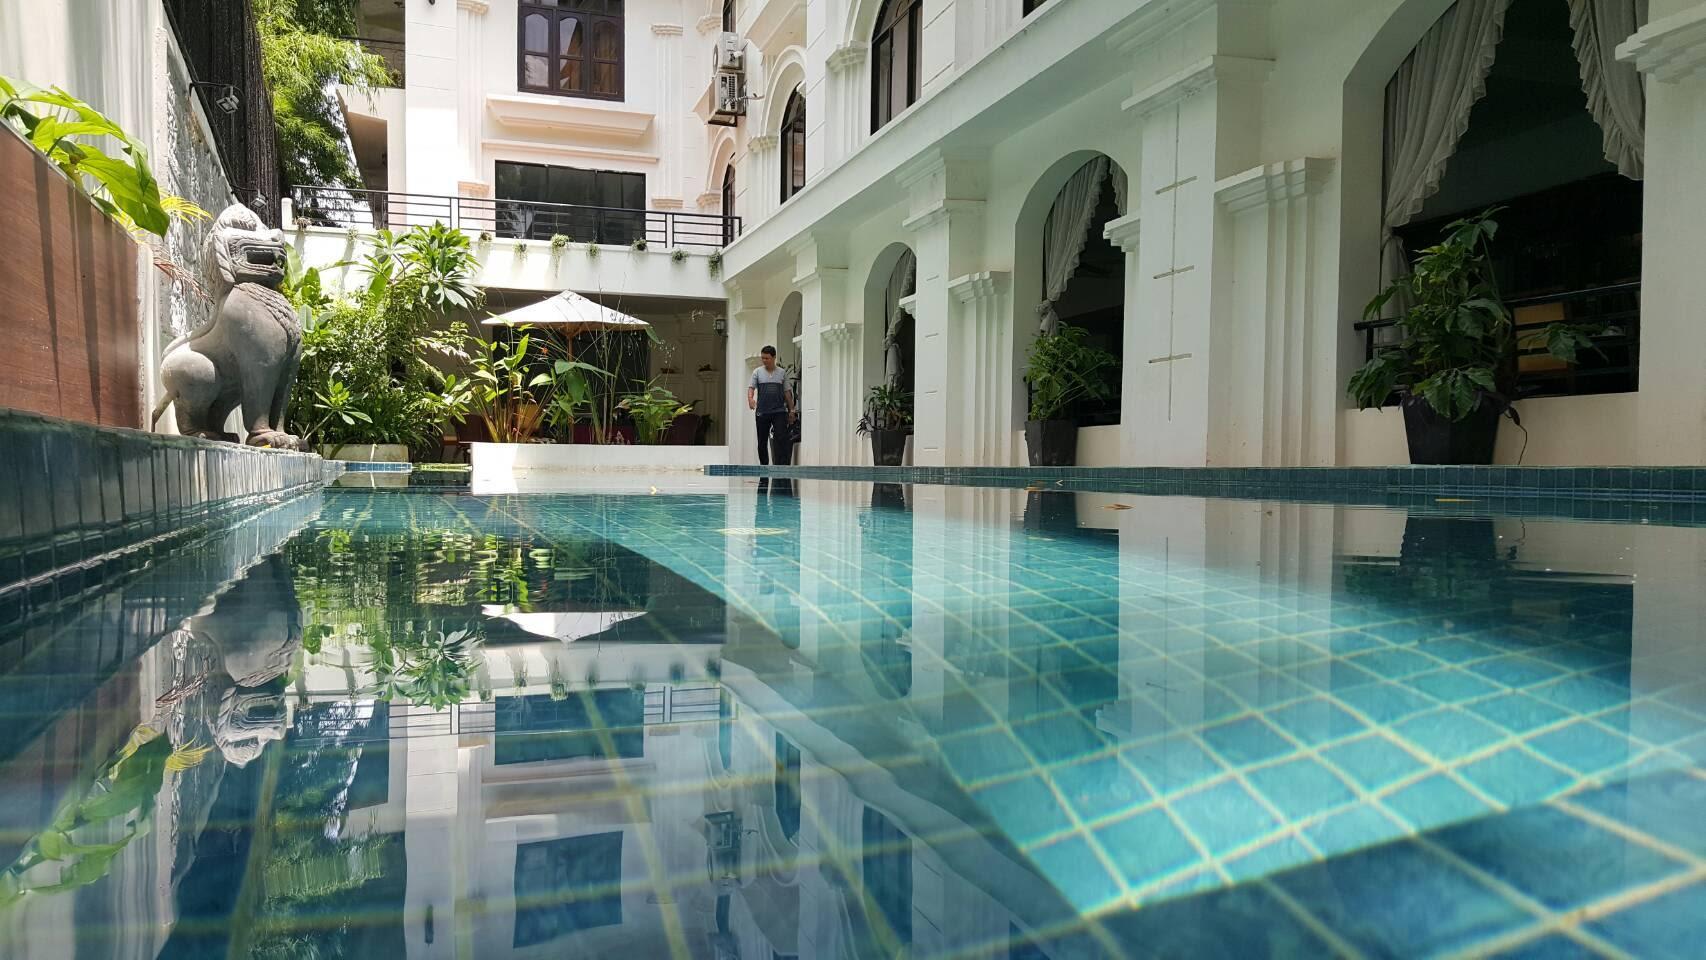 Angkor Vireak Chey Hotel Reviews